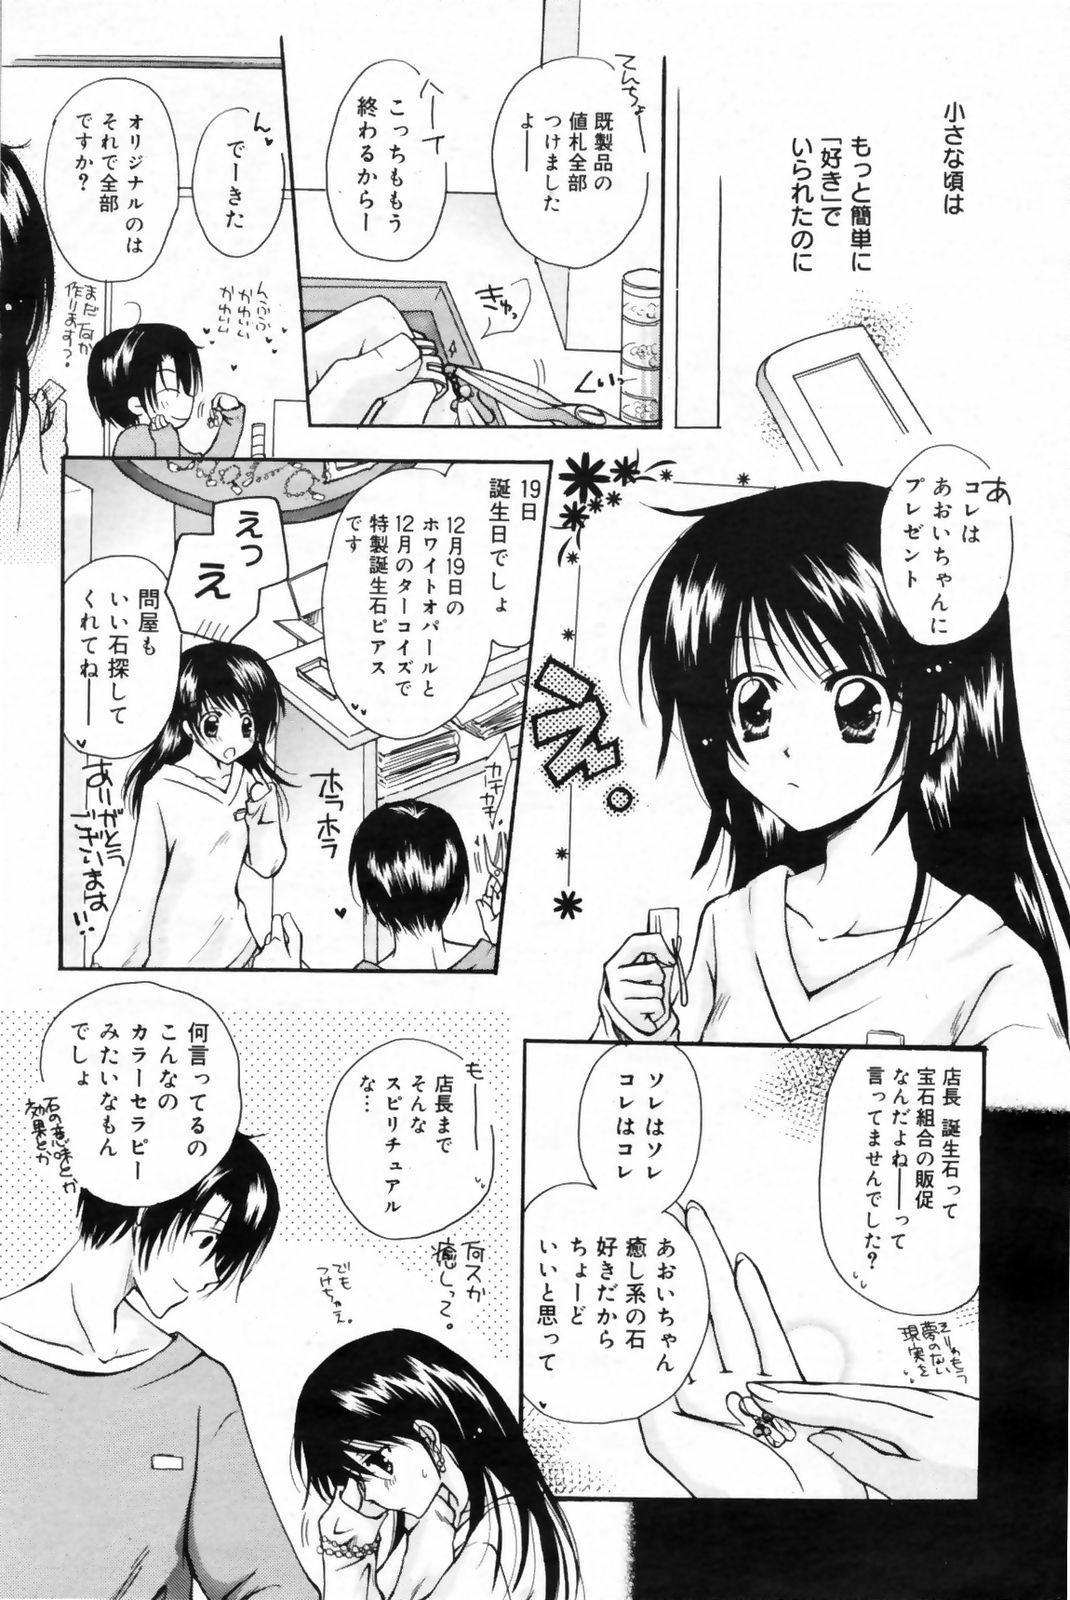 Manga Bangaichi 2009-02 Vol. 234 121